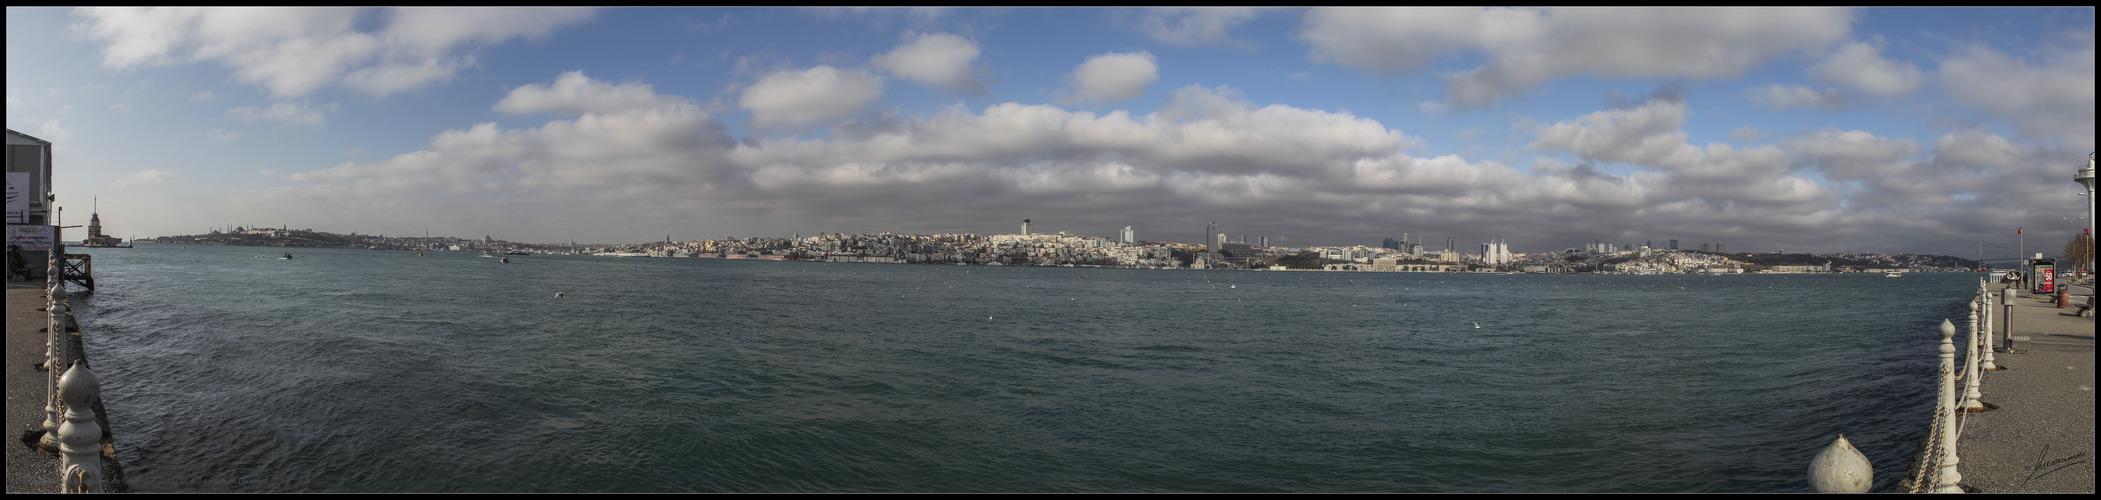 Panorámica zona moderna de Estambul desde la orilla Asiática (Turquia)